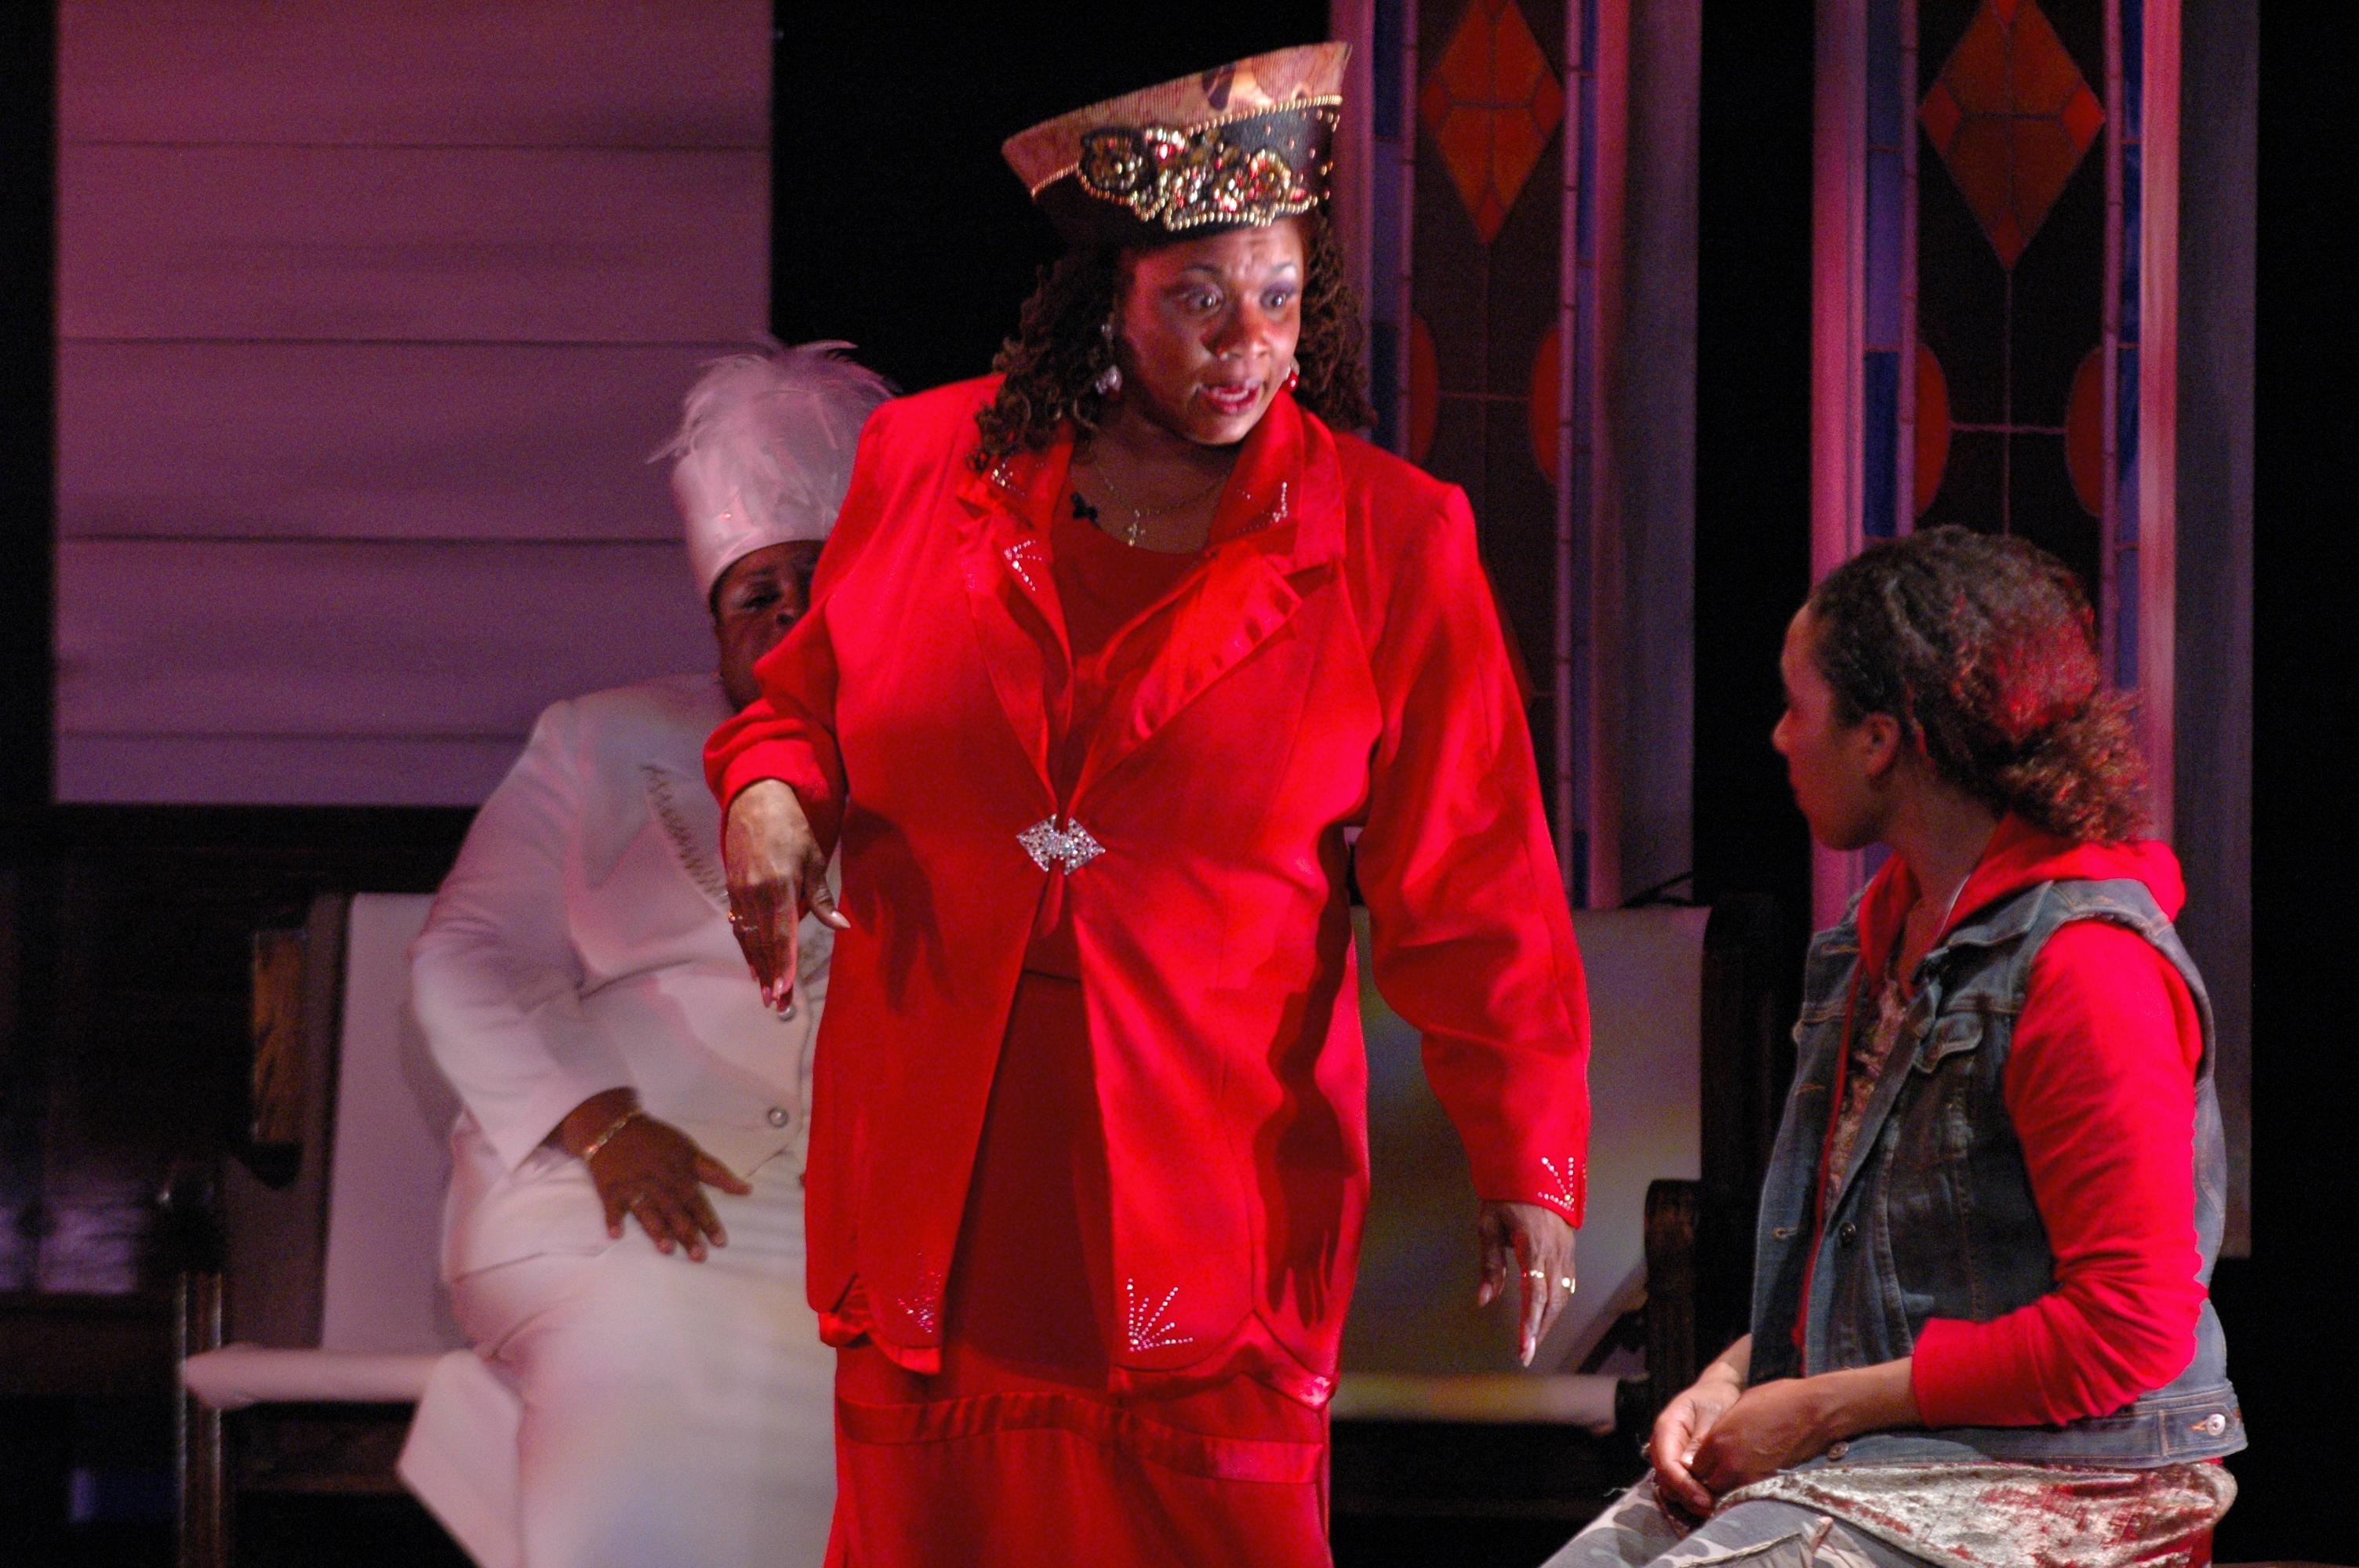 Crowns is Celebration of Black Womanhood